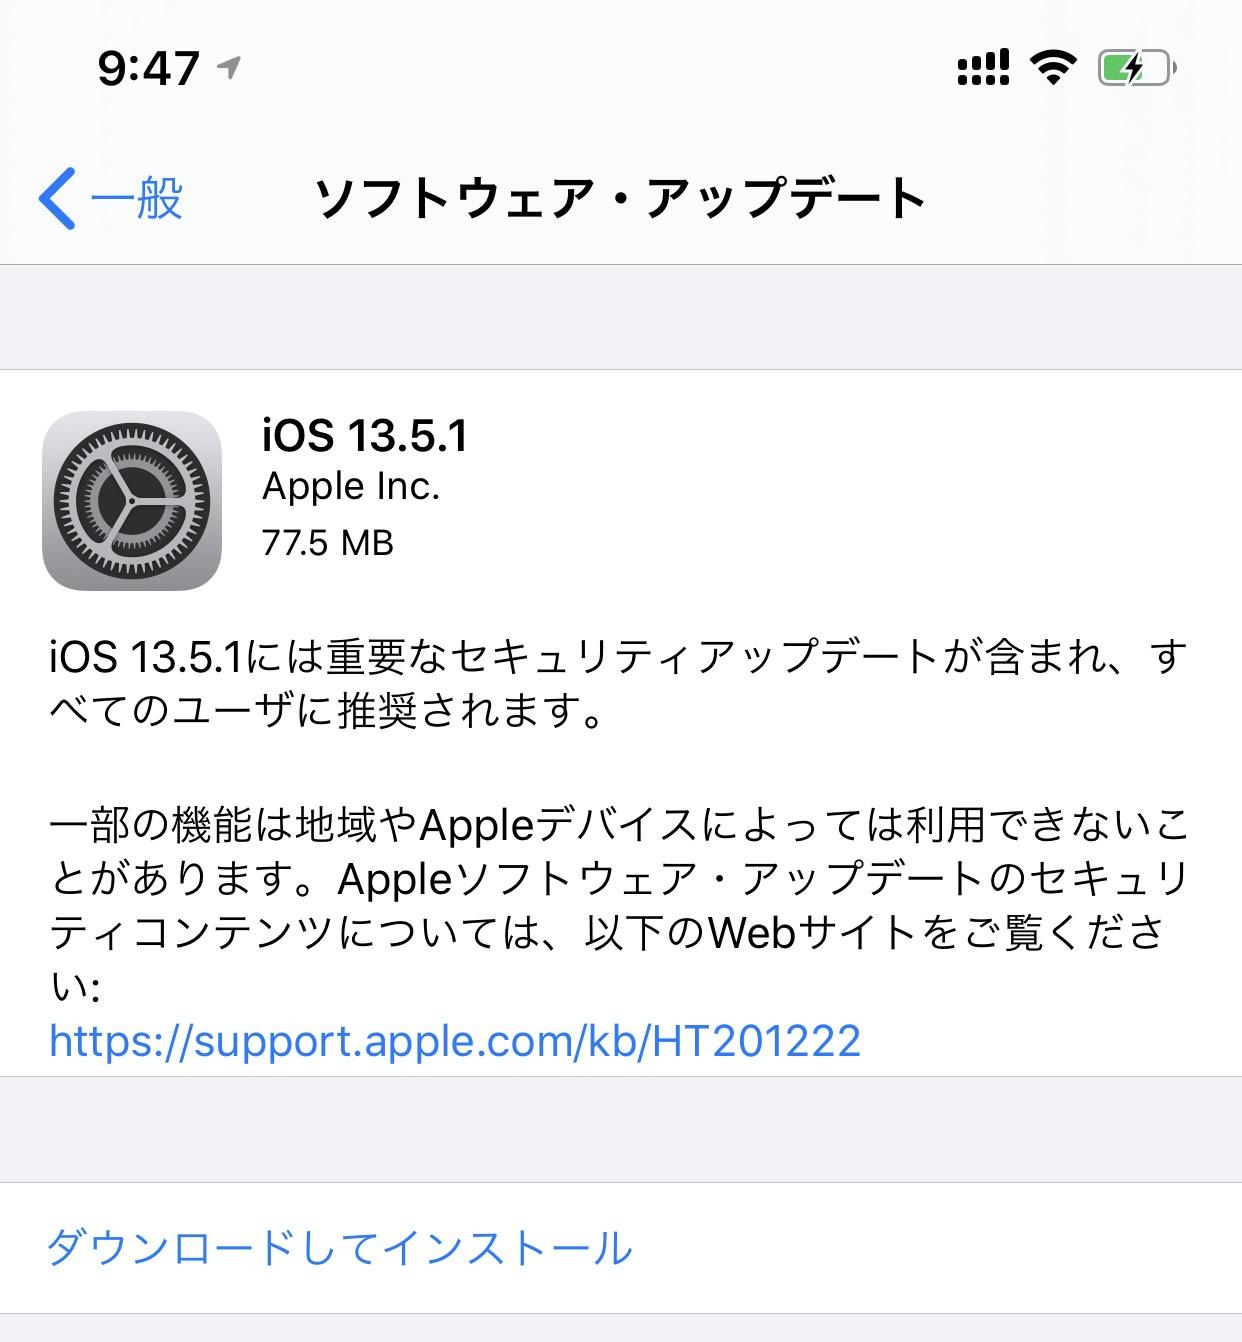 【iOS 13】「iOS 13.5.1ソフトウェアアップデート」リリース